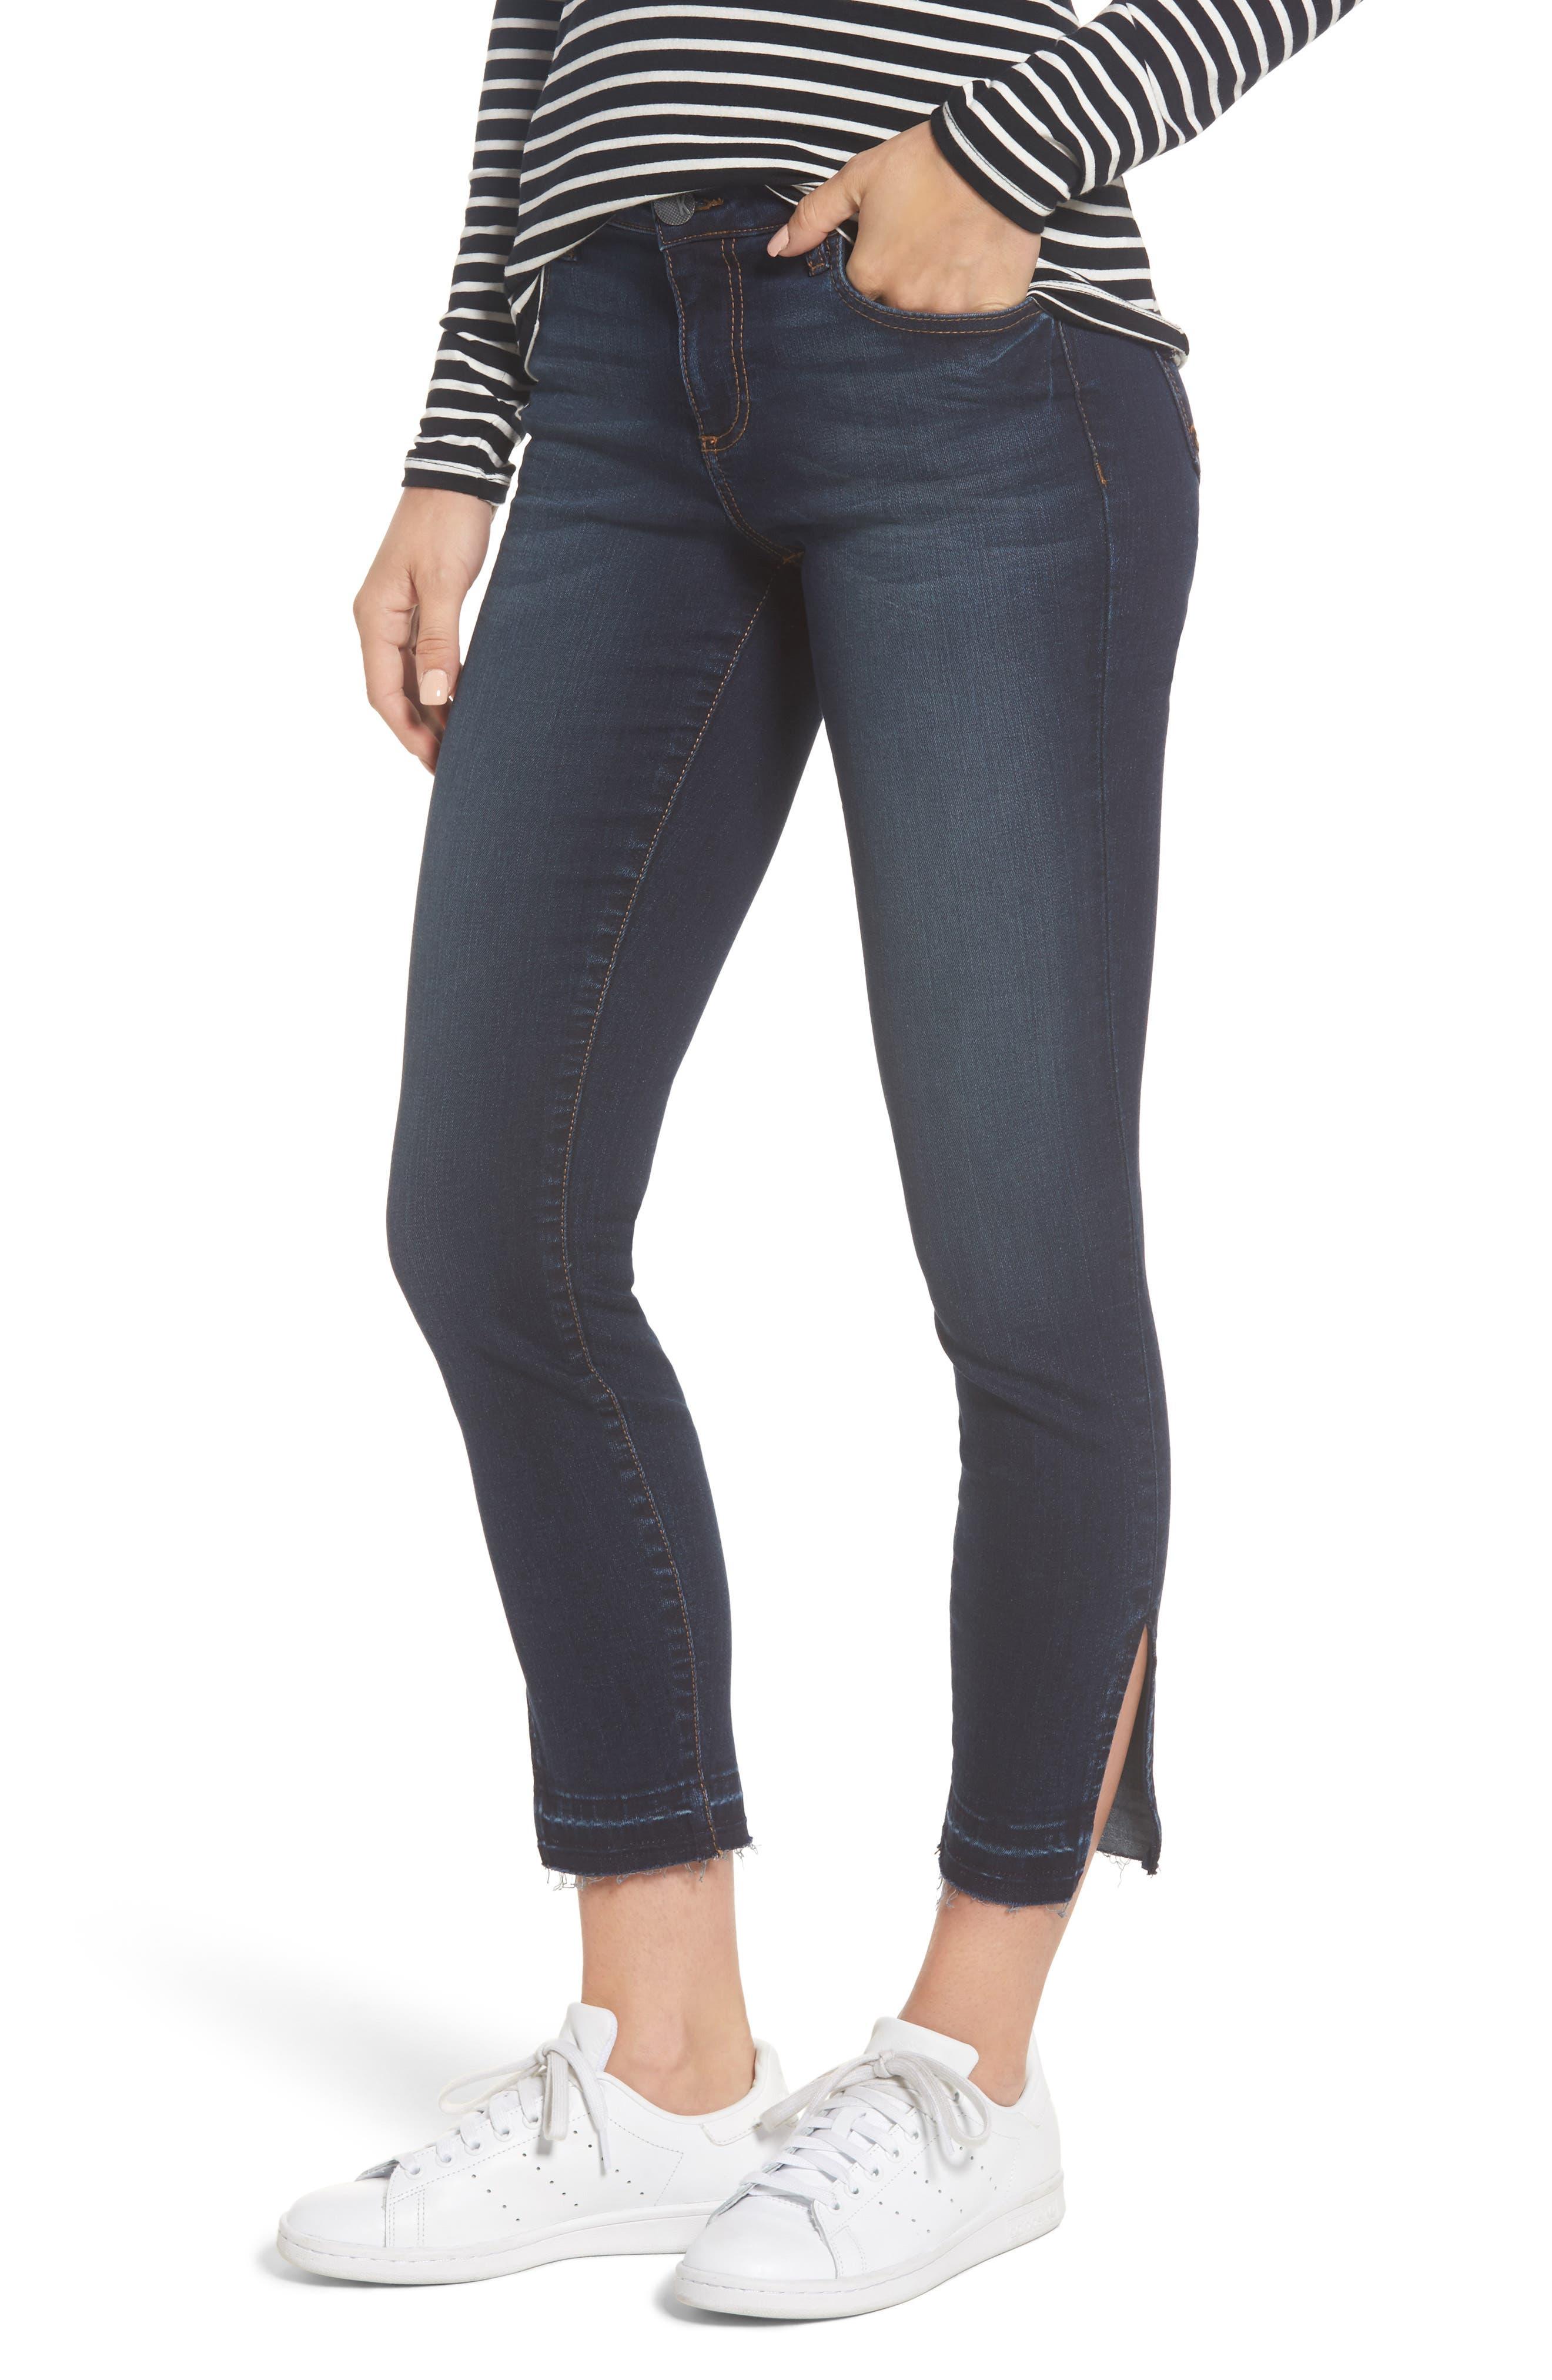 Connie Release Hem Ankle Skinny Jeans,                         Main,                         color, Originate